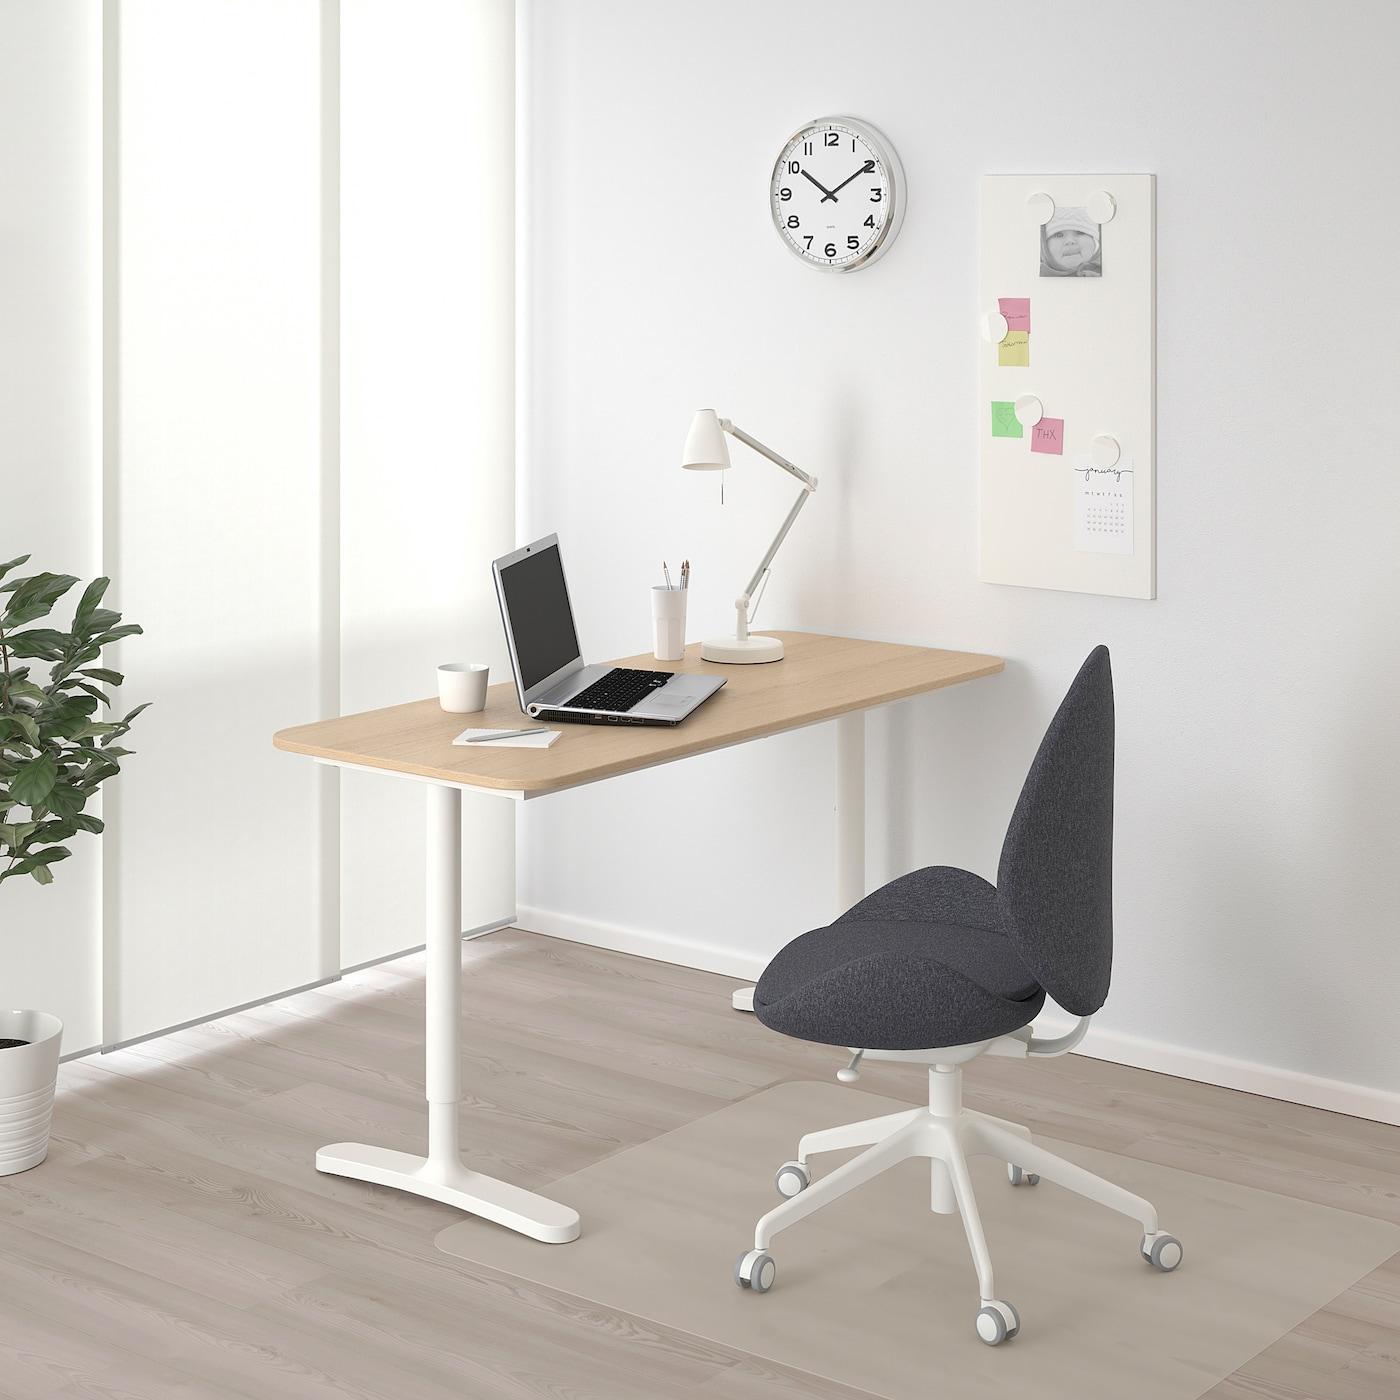 BEKANT Stôl, bielo morená dub dyha/biela, 140x60 cm